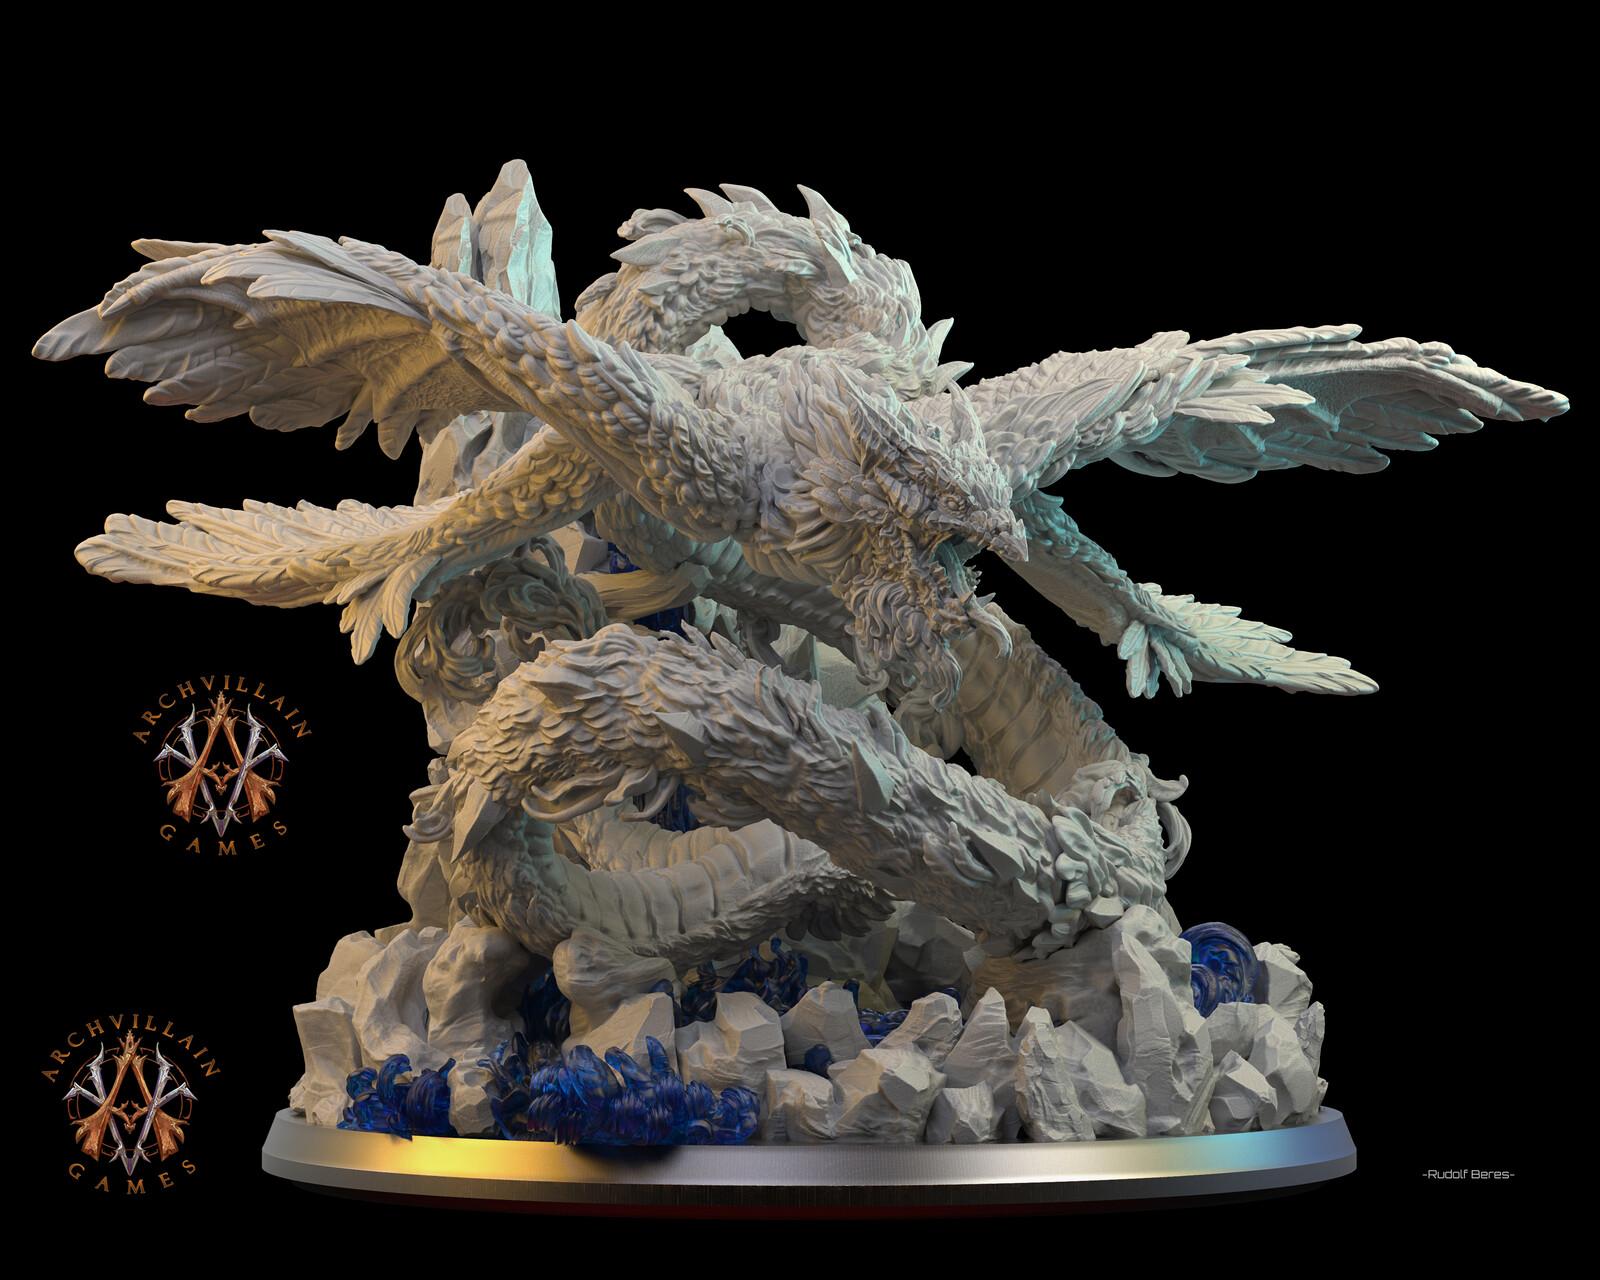 Dragon_Miniatur